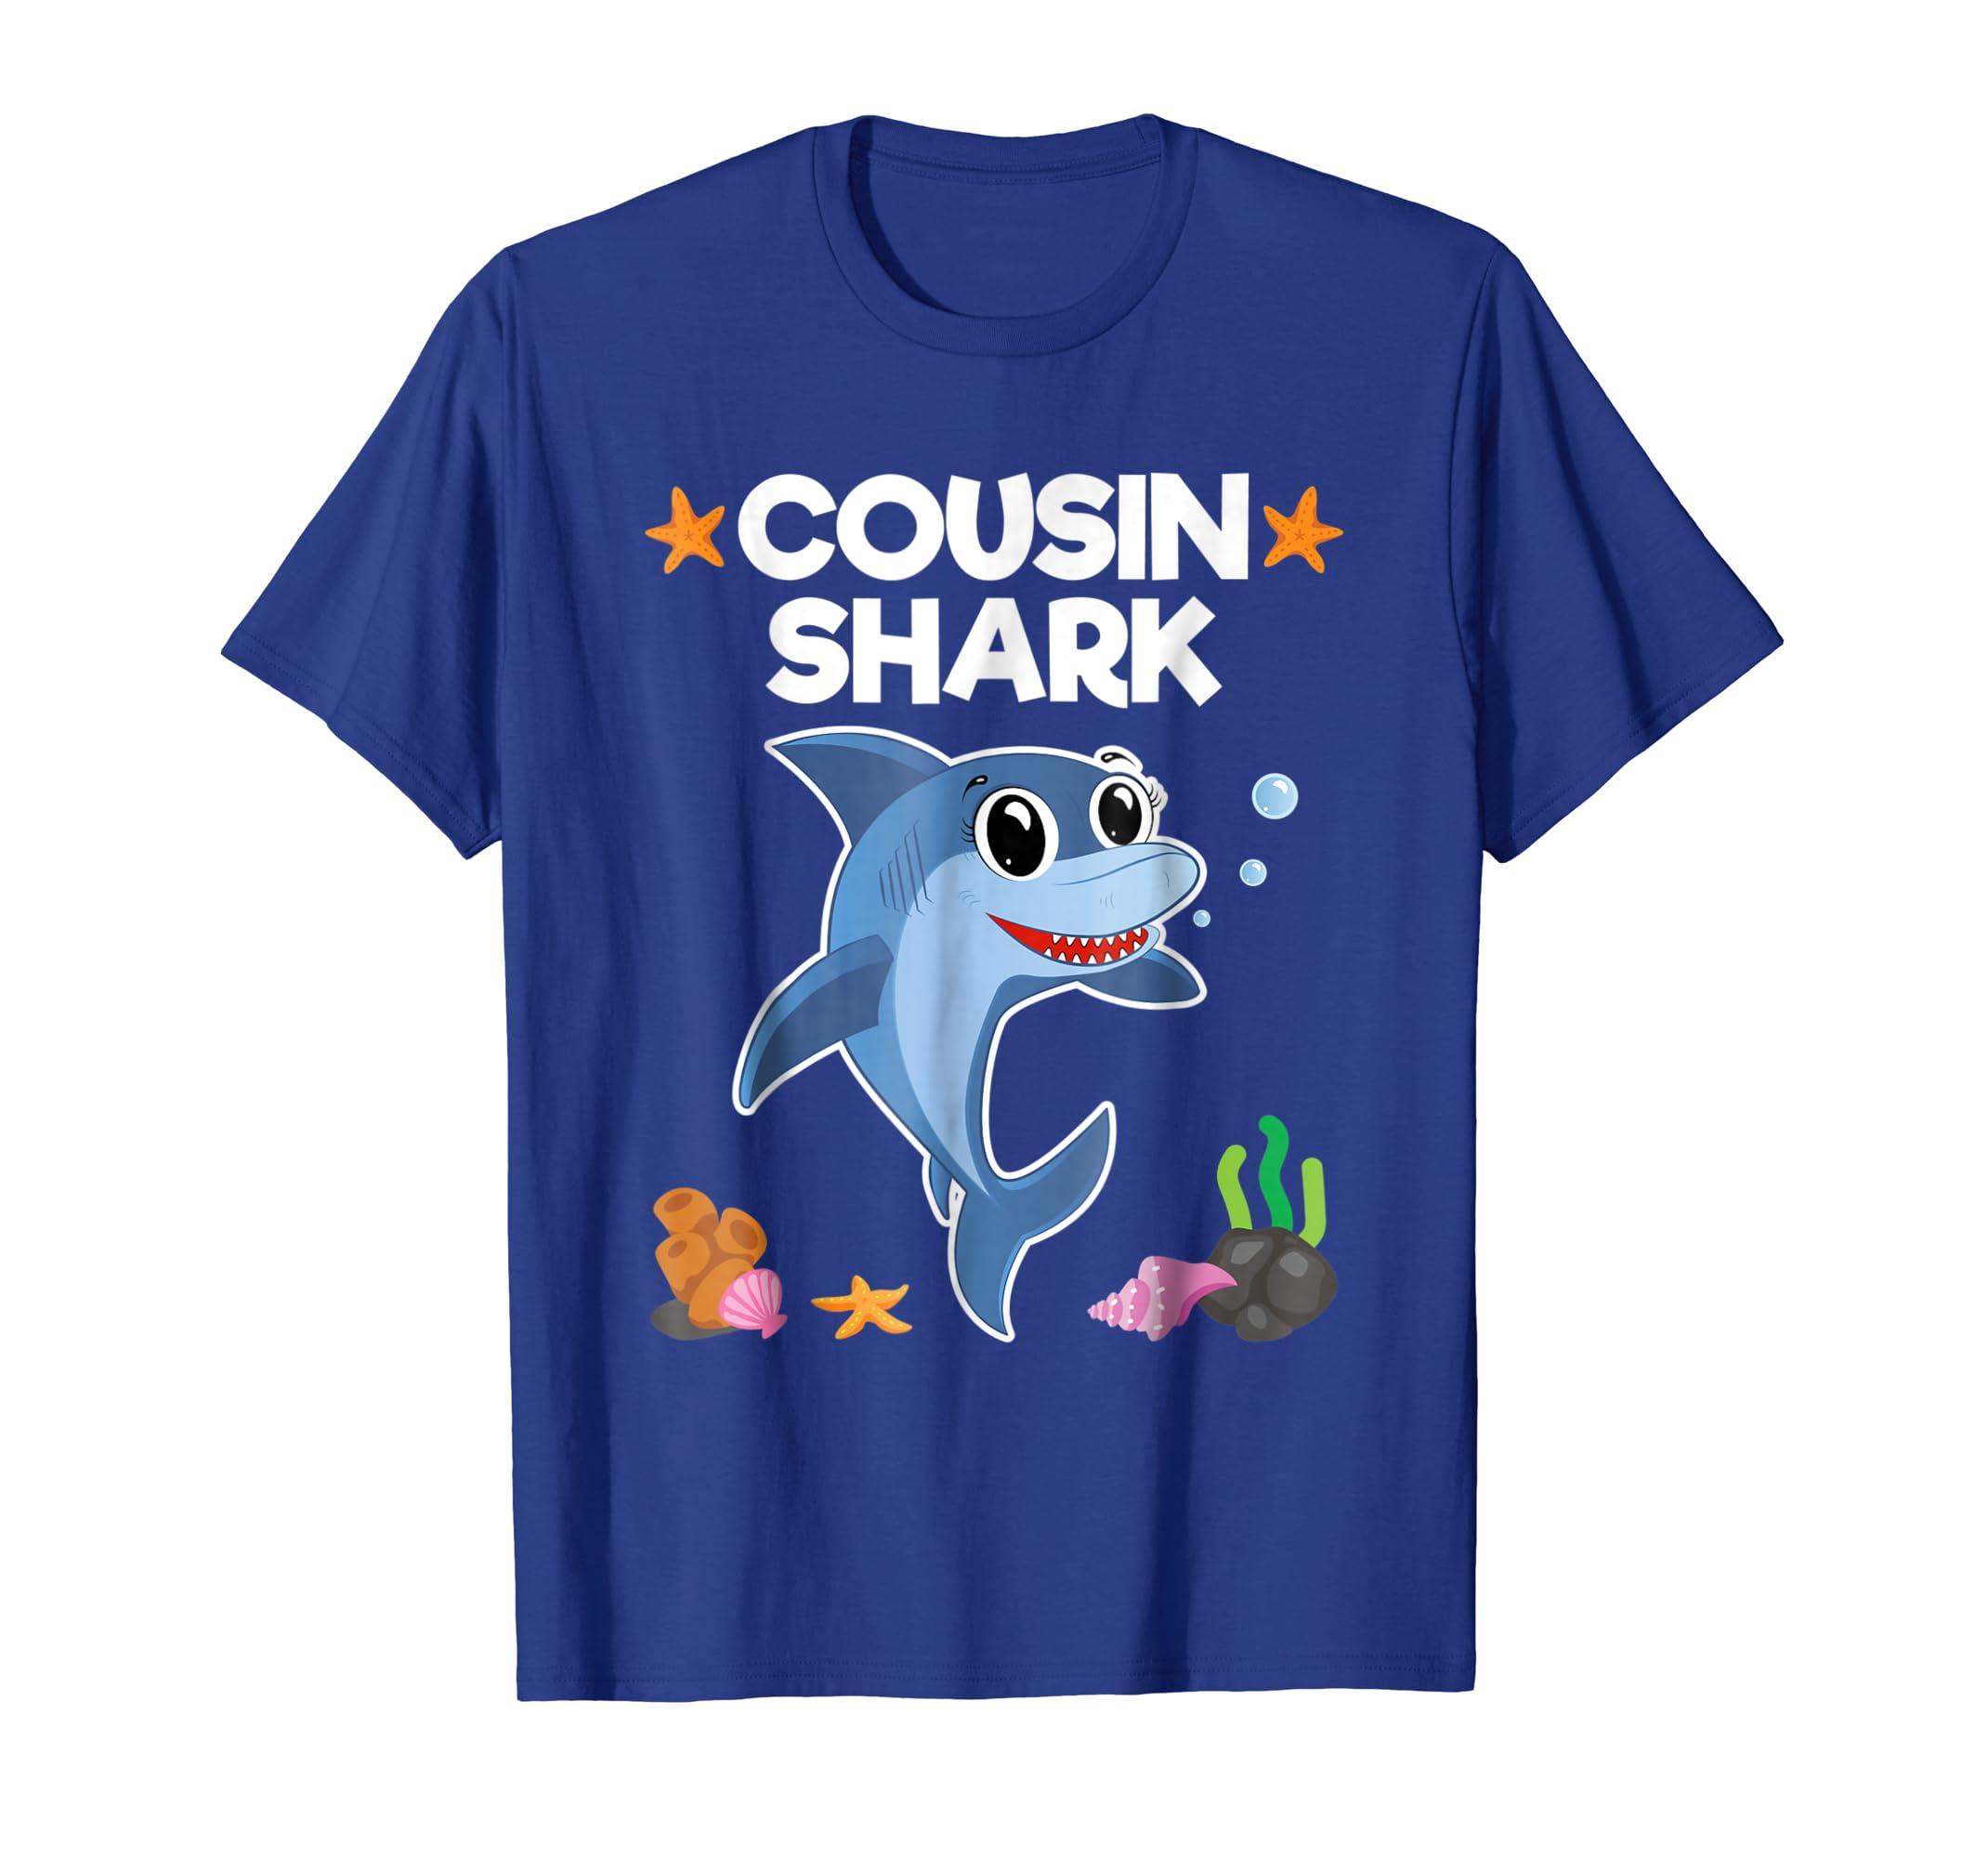 Amazon Cousin Shark Shirt Sister Brother Baby Birthday Gift Clothing